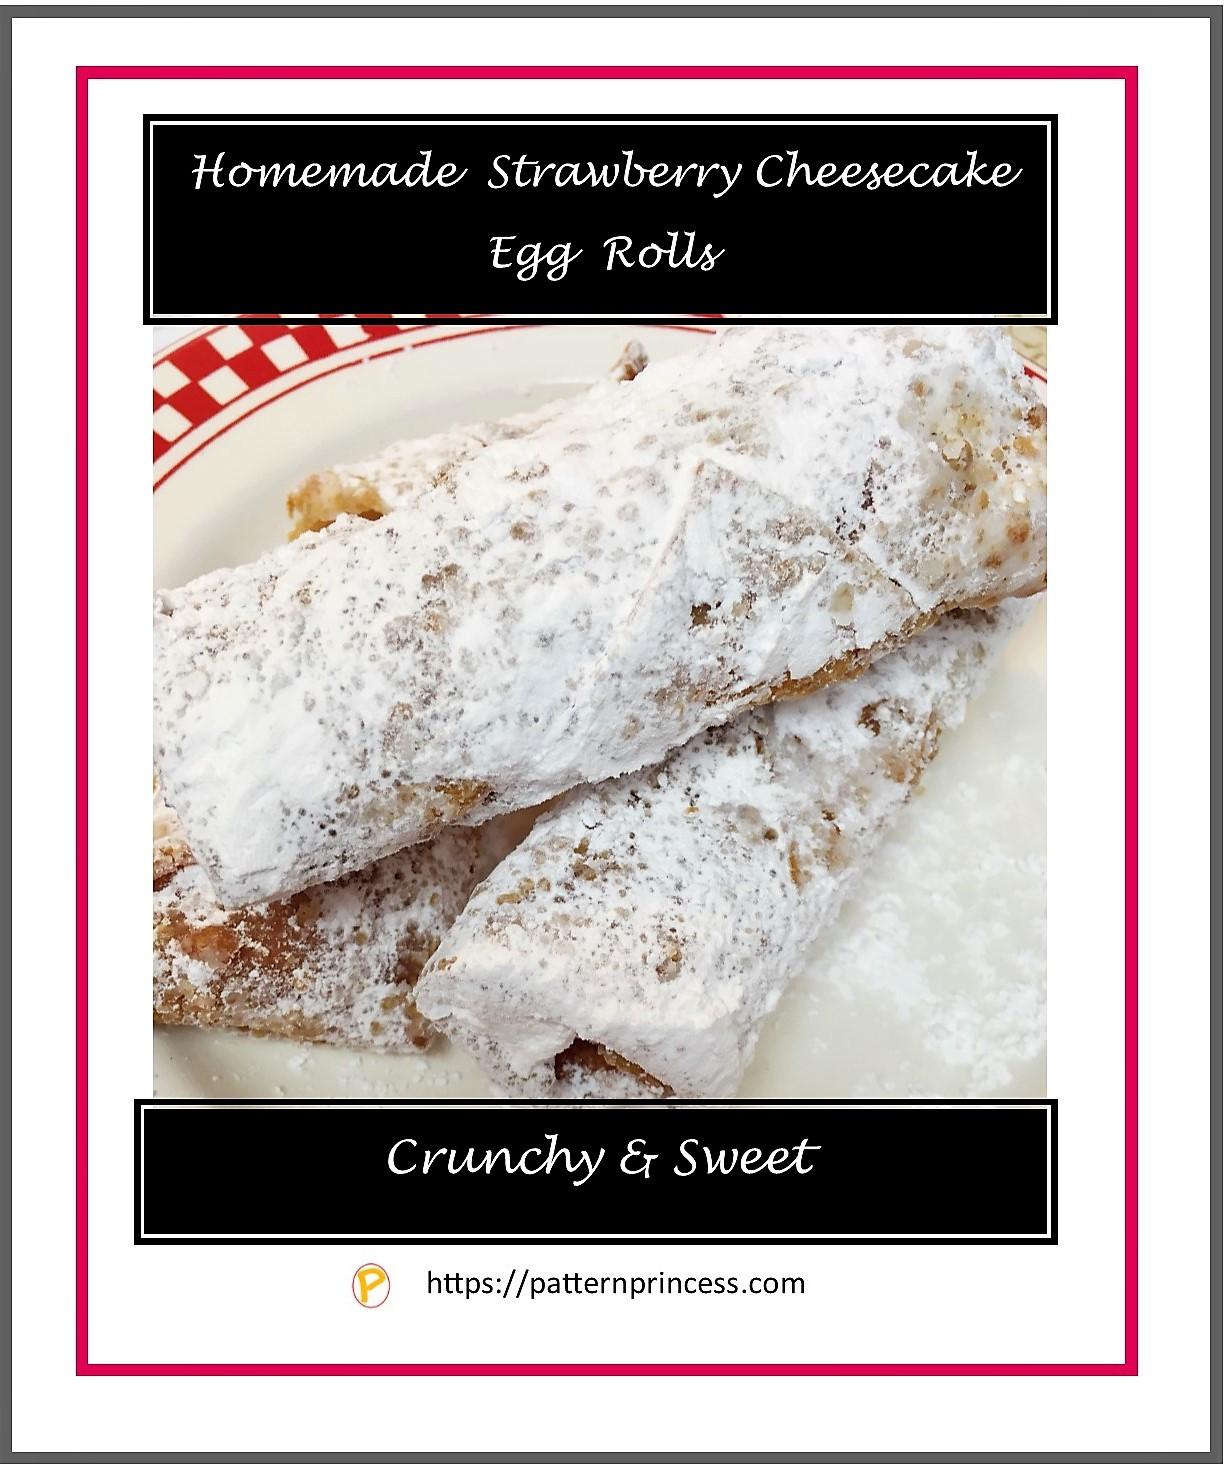 Homemade Strawberry Cheesecake Egg Rolls